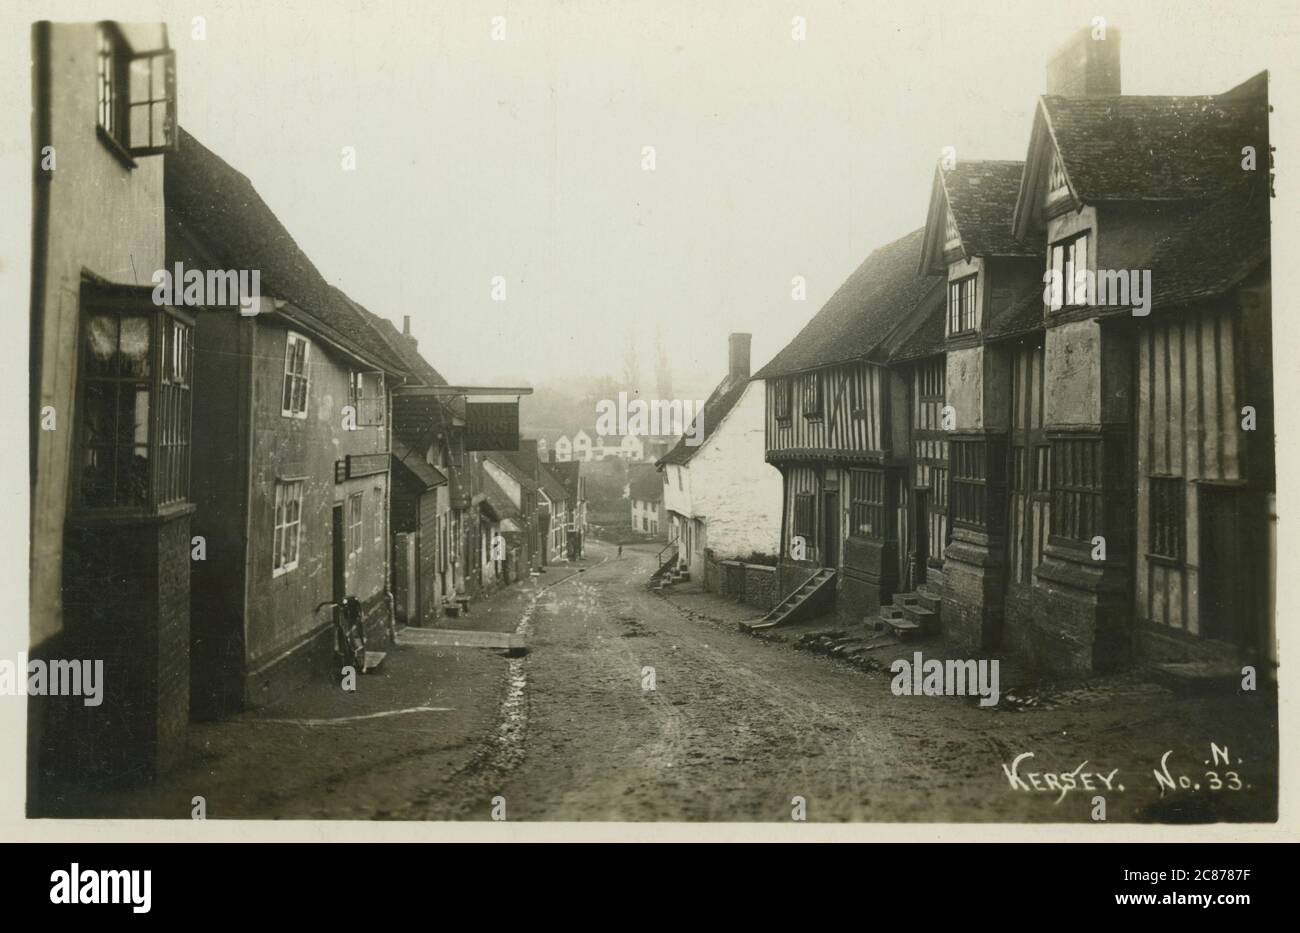 The Street, Kersey, Ipswich, Babergh, Suffolk, Inghilterra. Data: 1900 Foto Stock